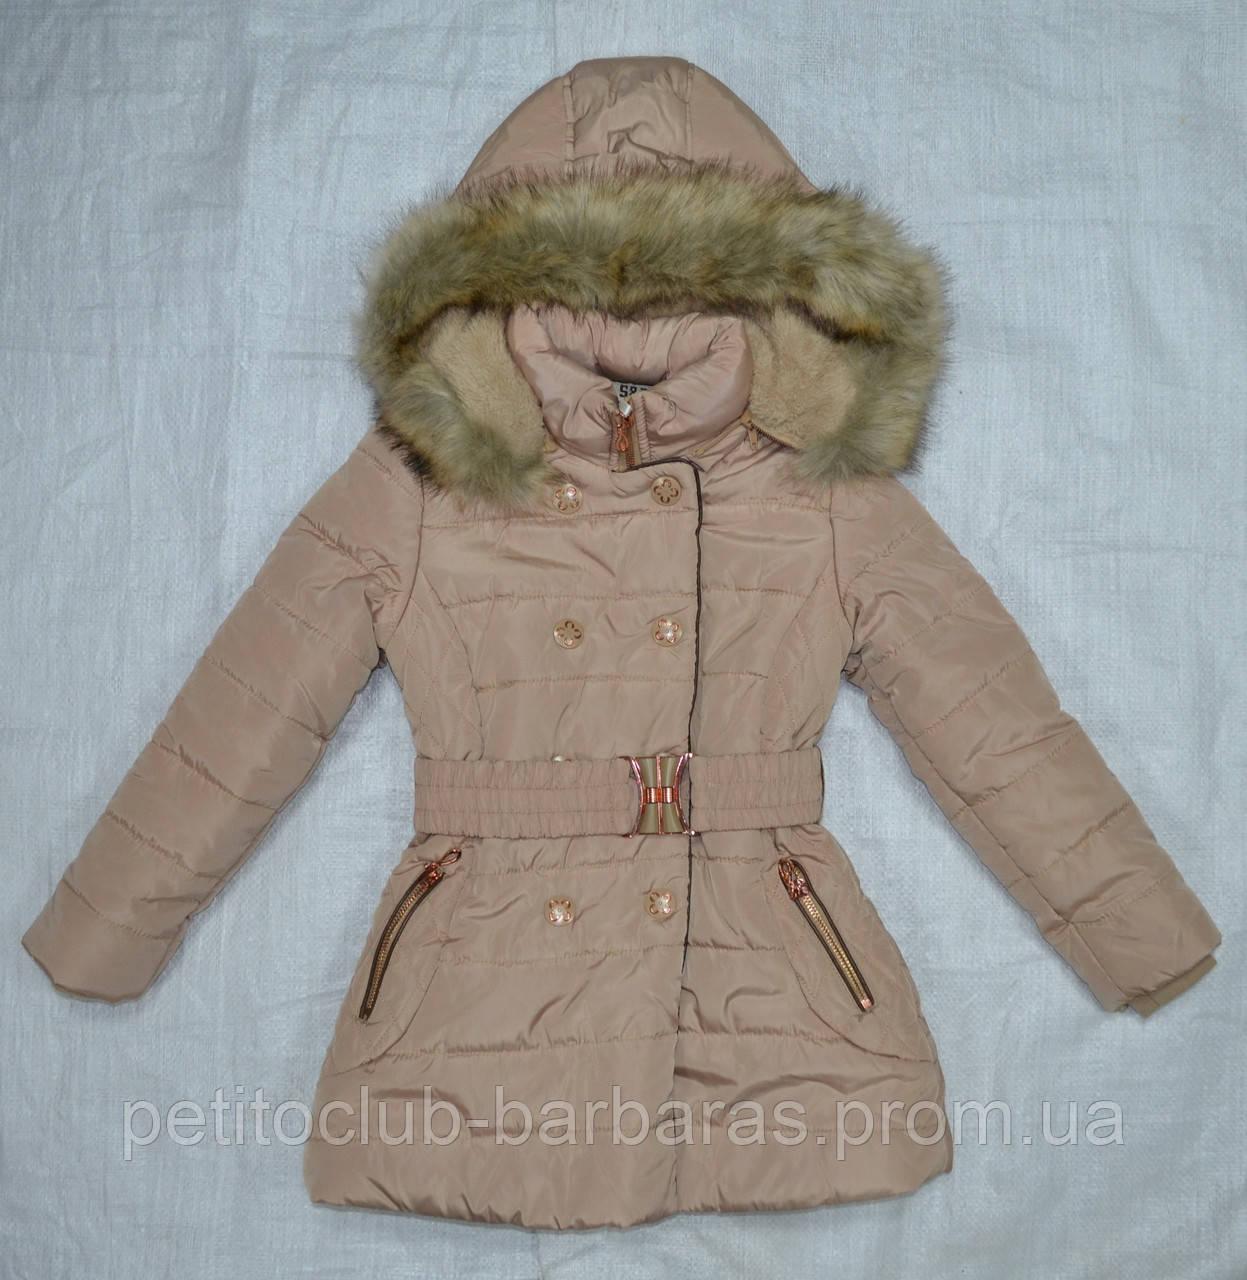 Куртка зимняя для девочки бежевая (S&D, Венгрия)